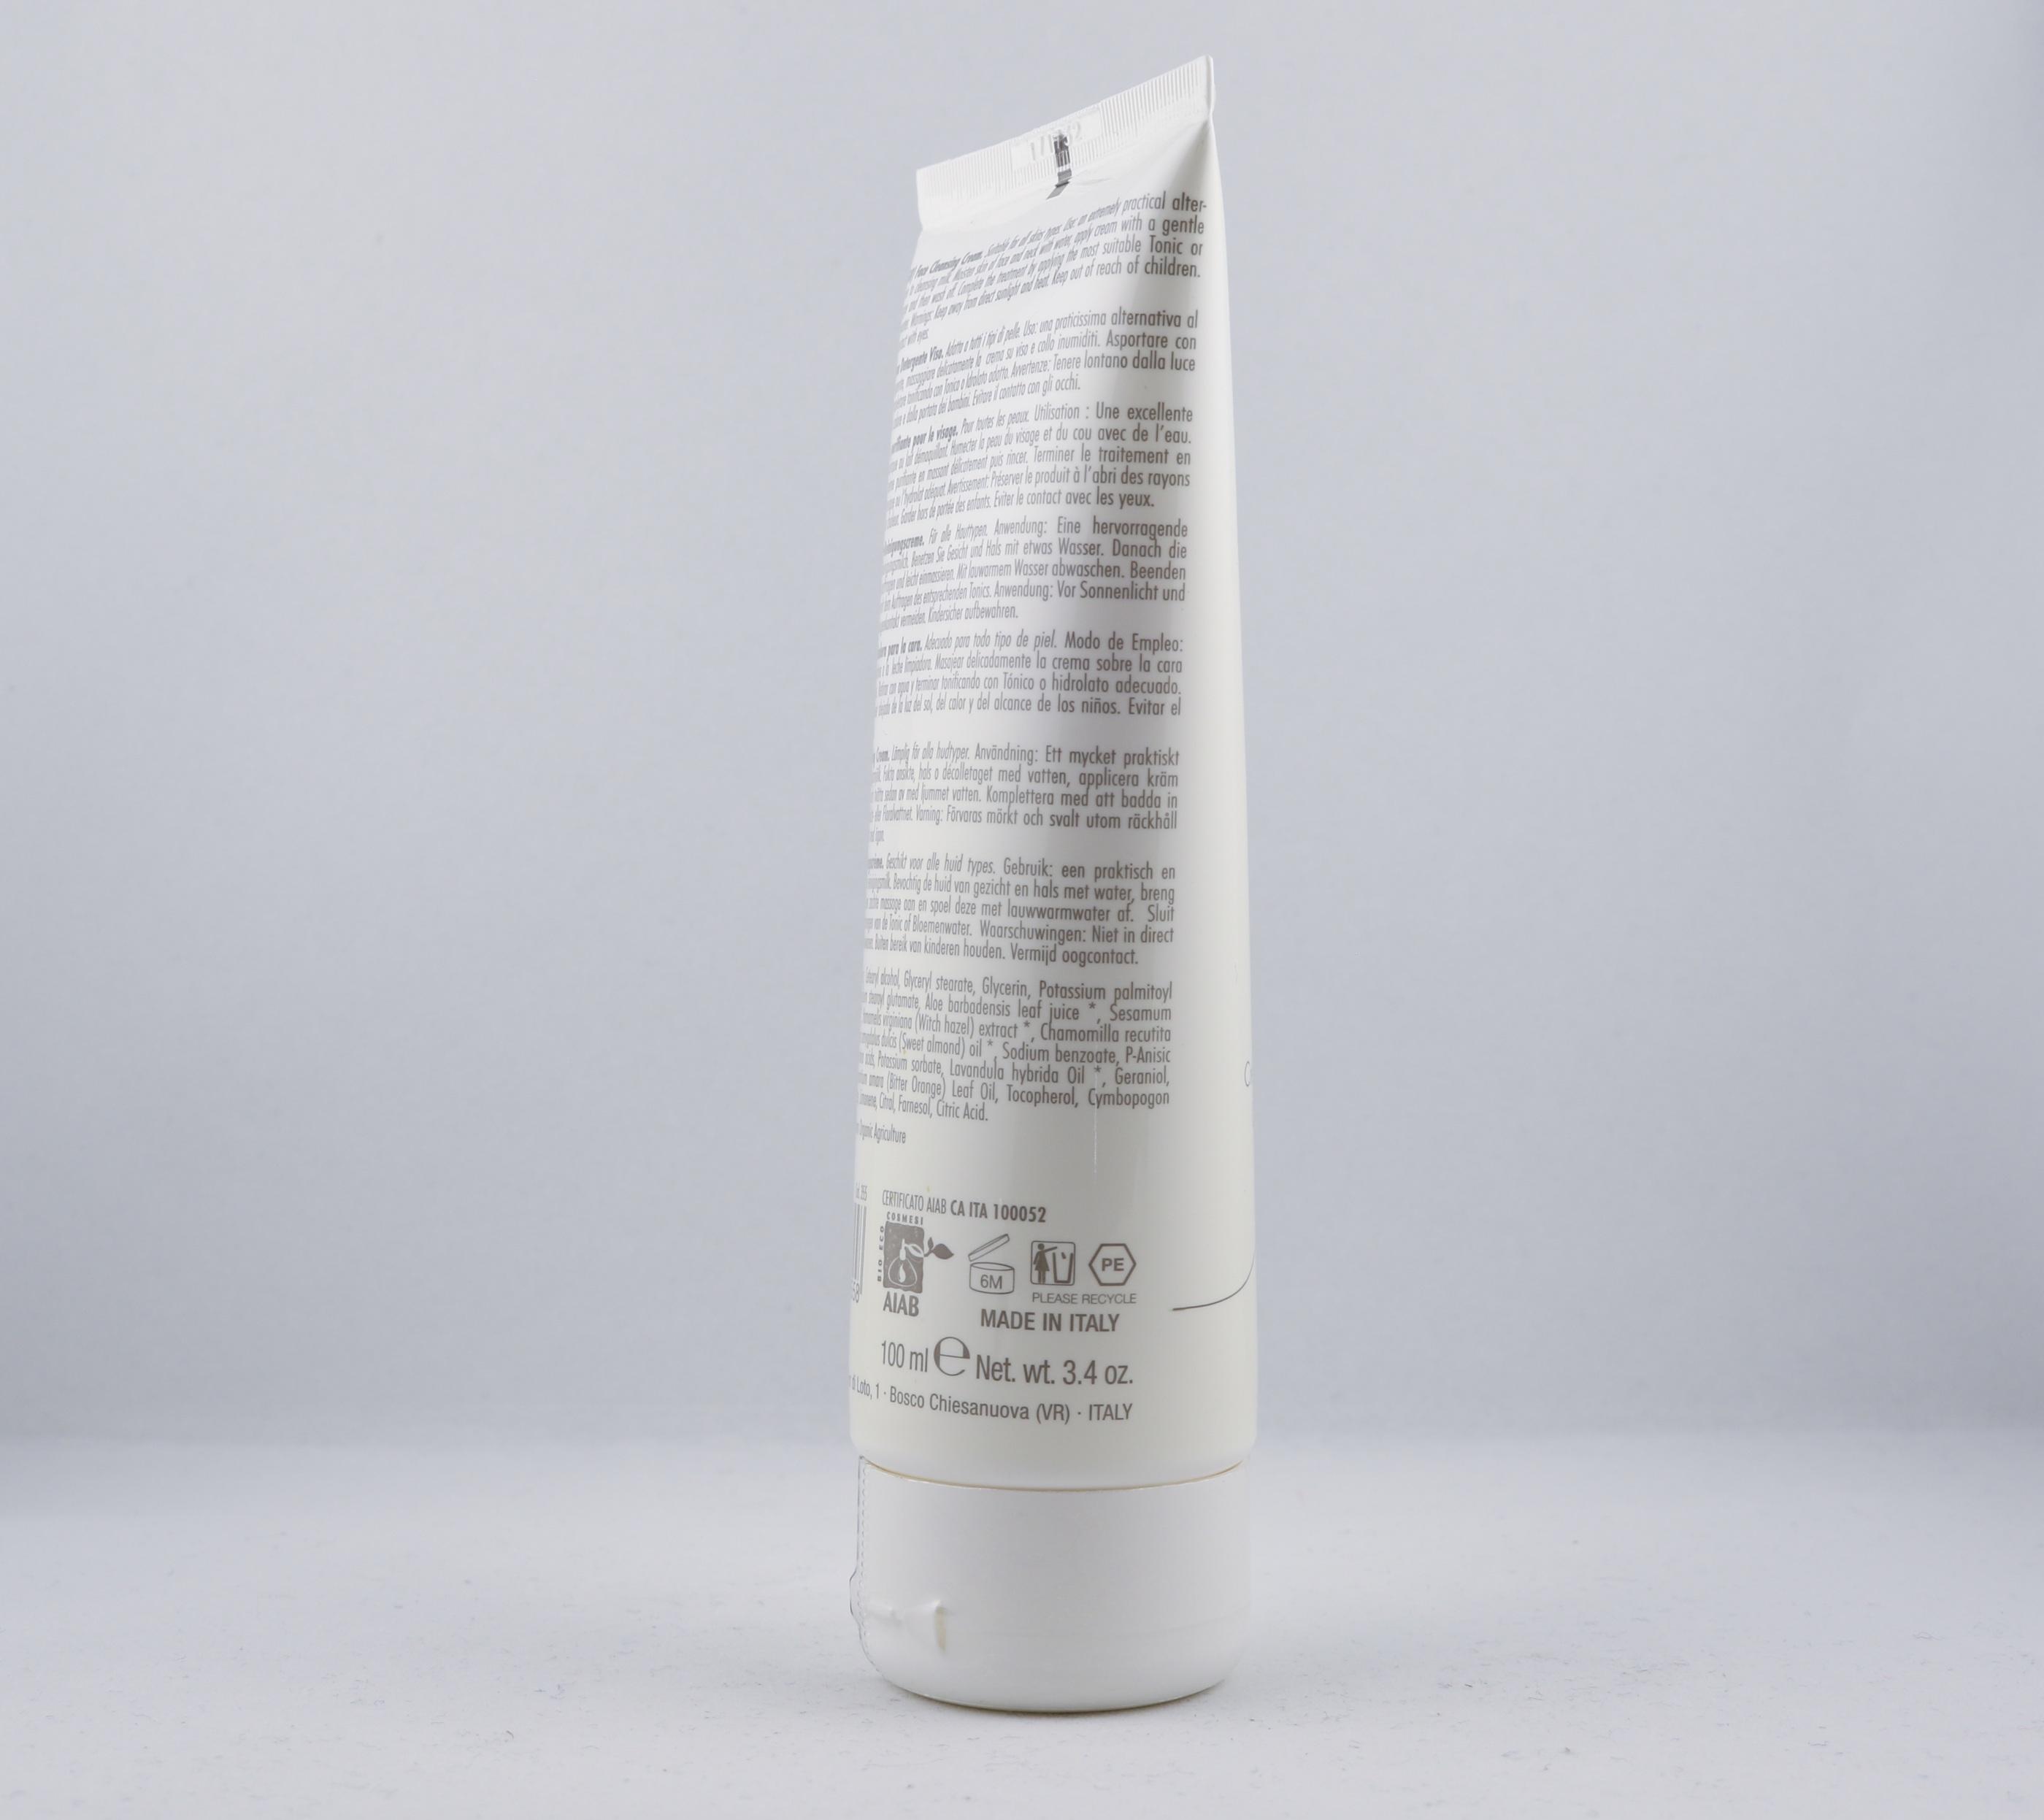 Tridosha Face Cleansing Cream wellness ayurveda halmstad sweden svensk hudvård